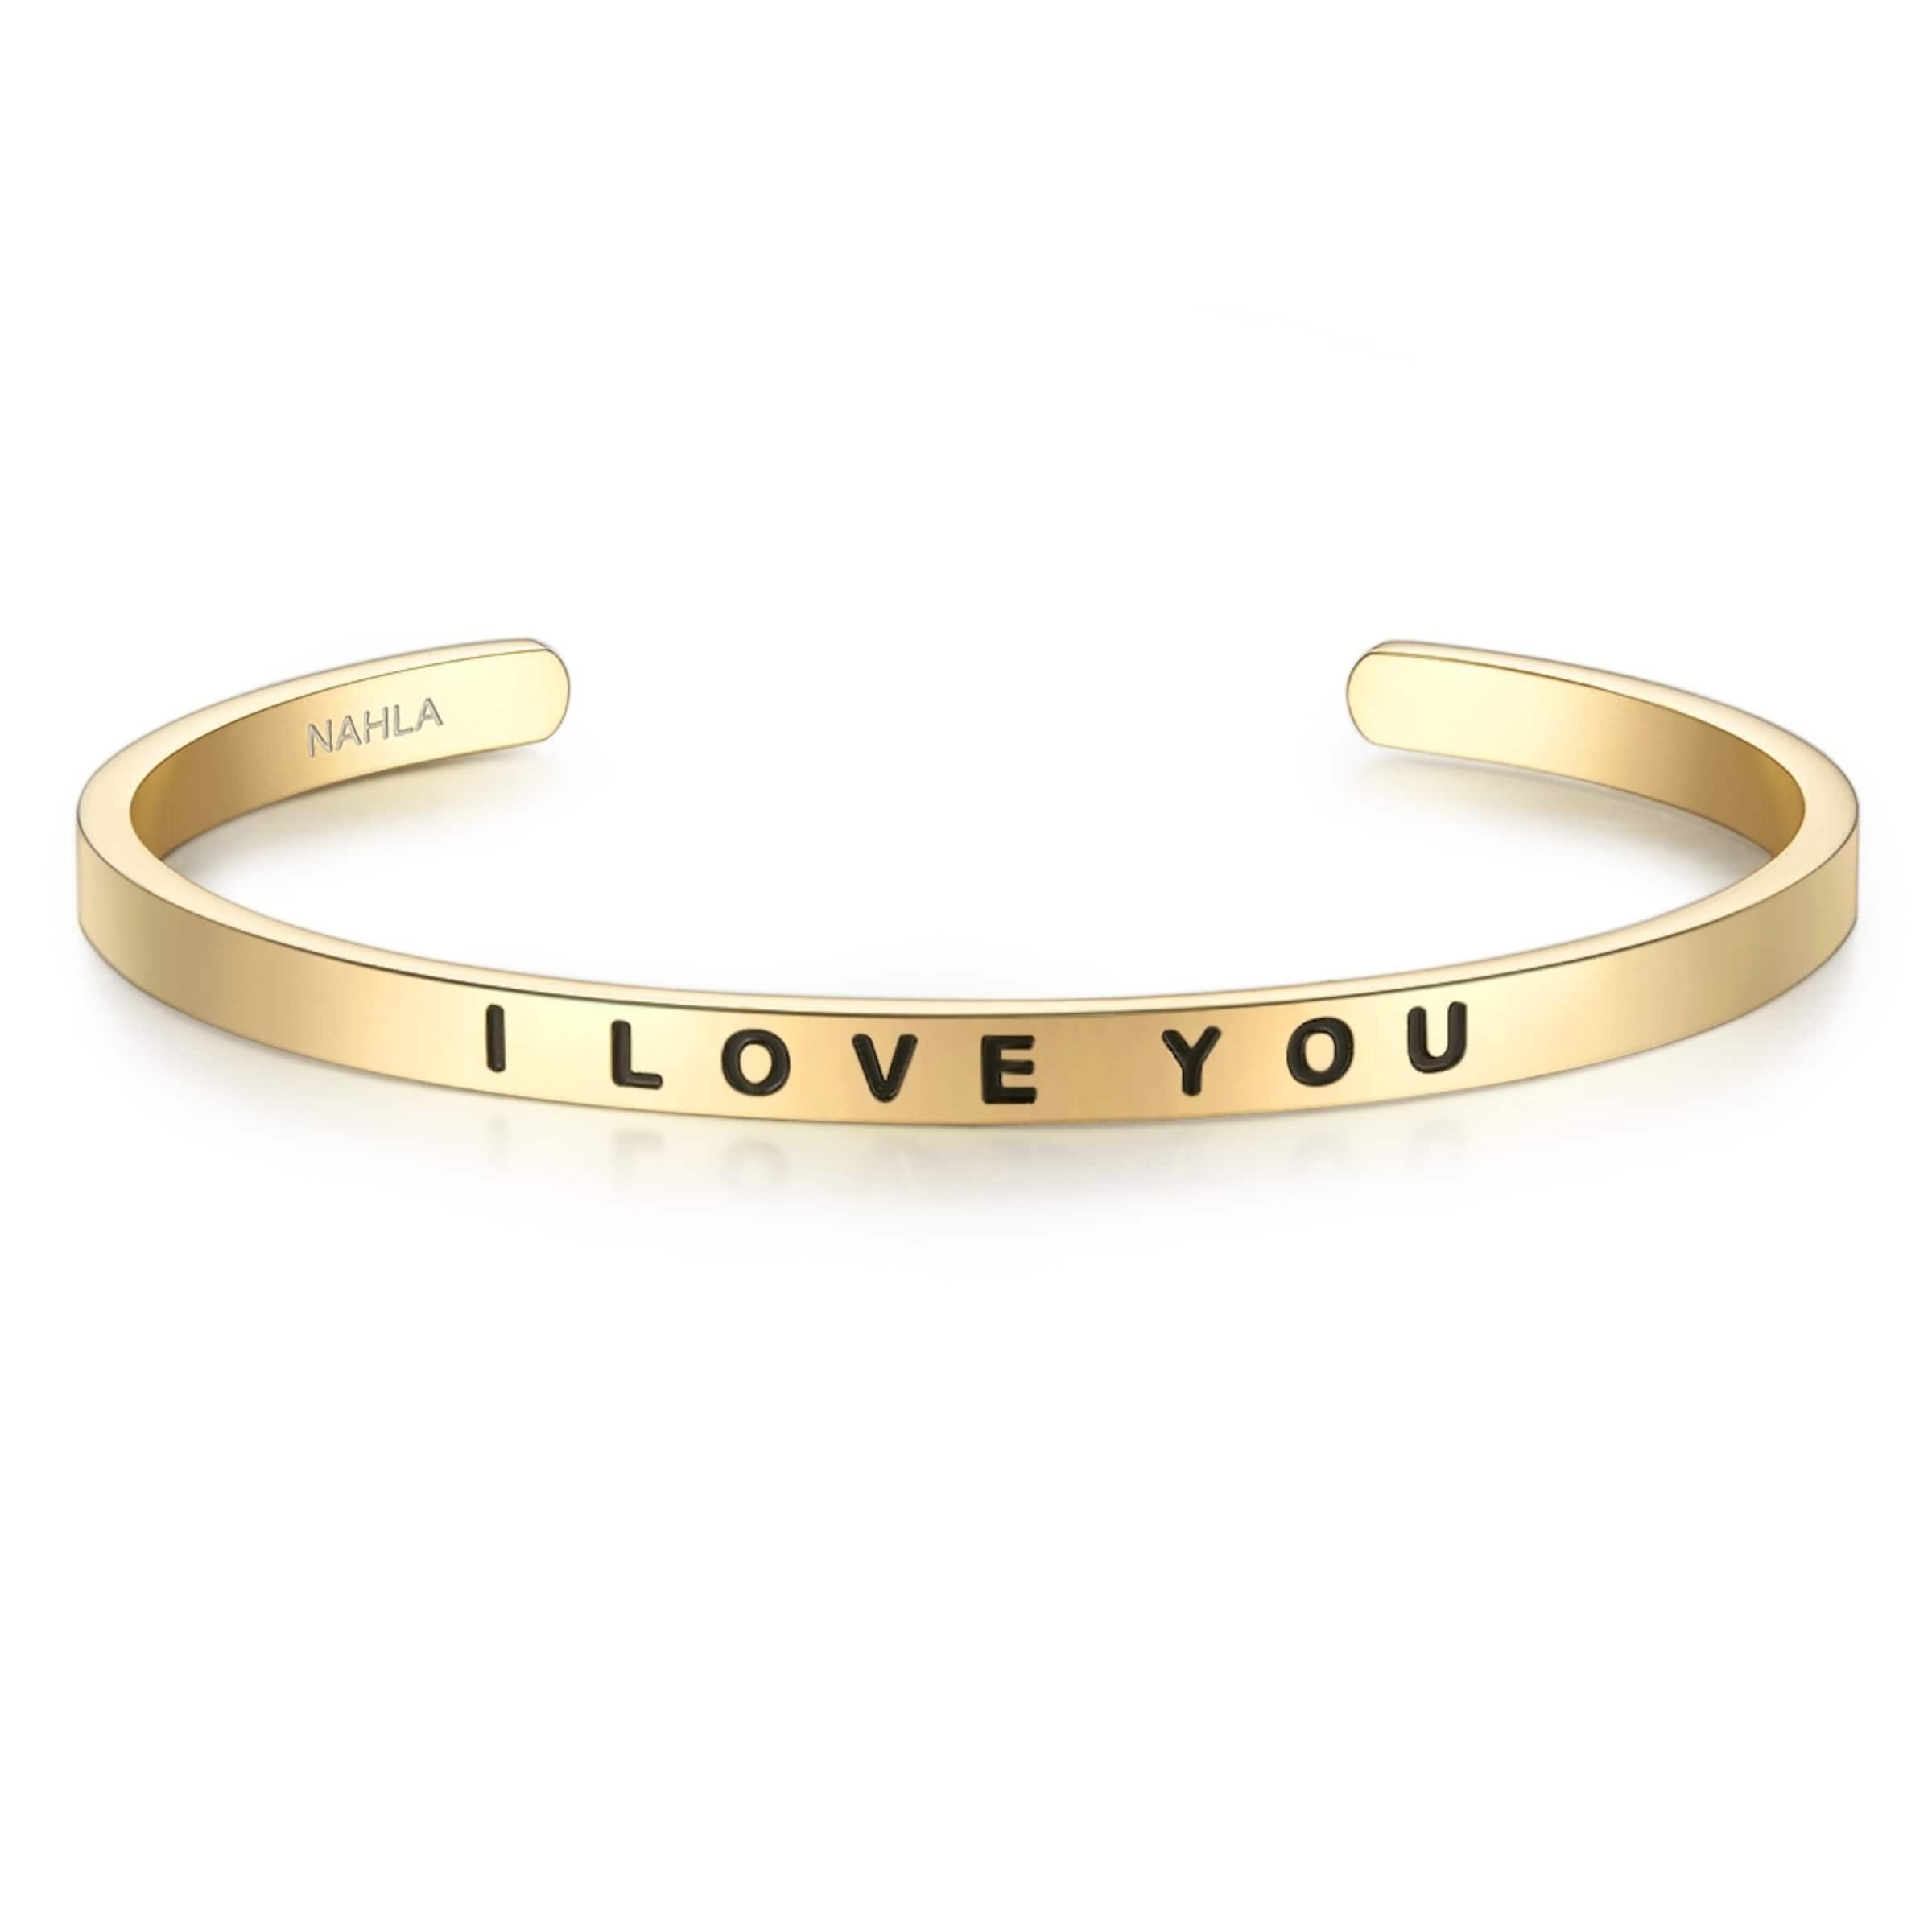 Ziellinie Nahla Jewels Armband Bangle mit I LOVE YOU-Gravur Verkauf Mode-Stil s350RDamm